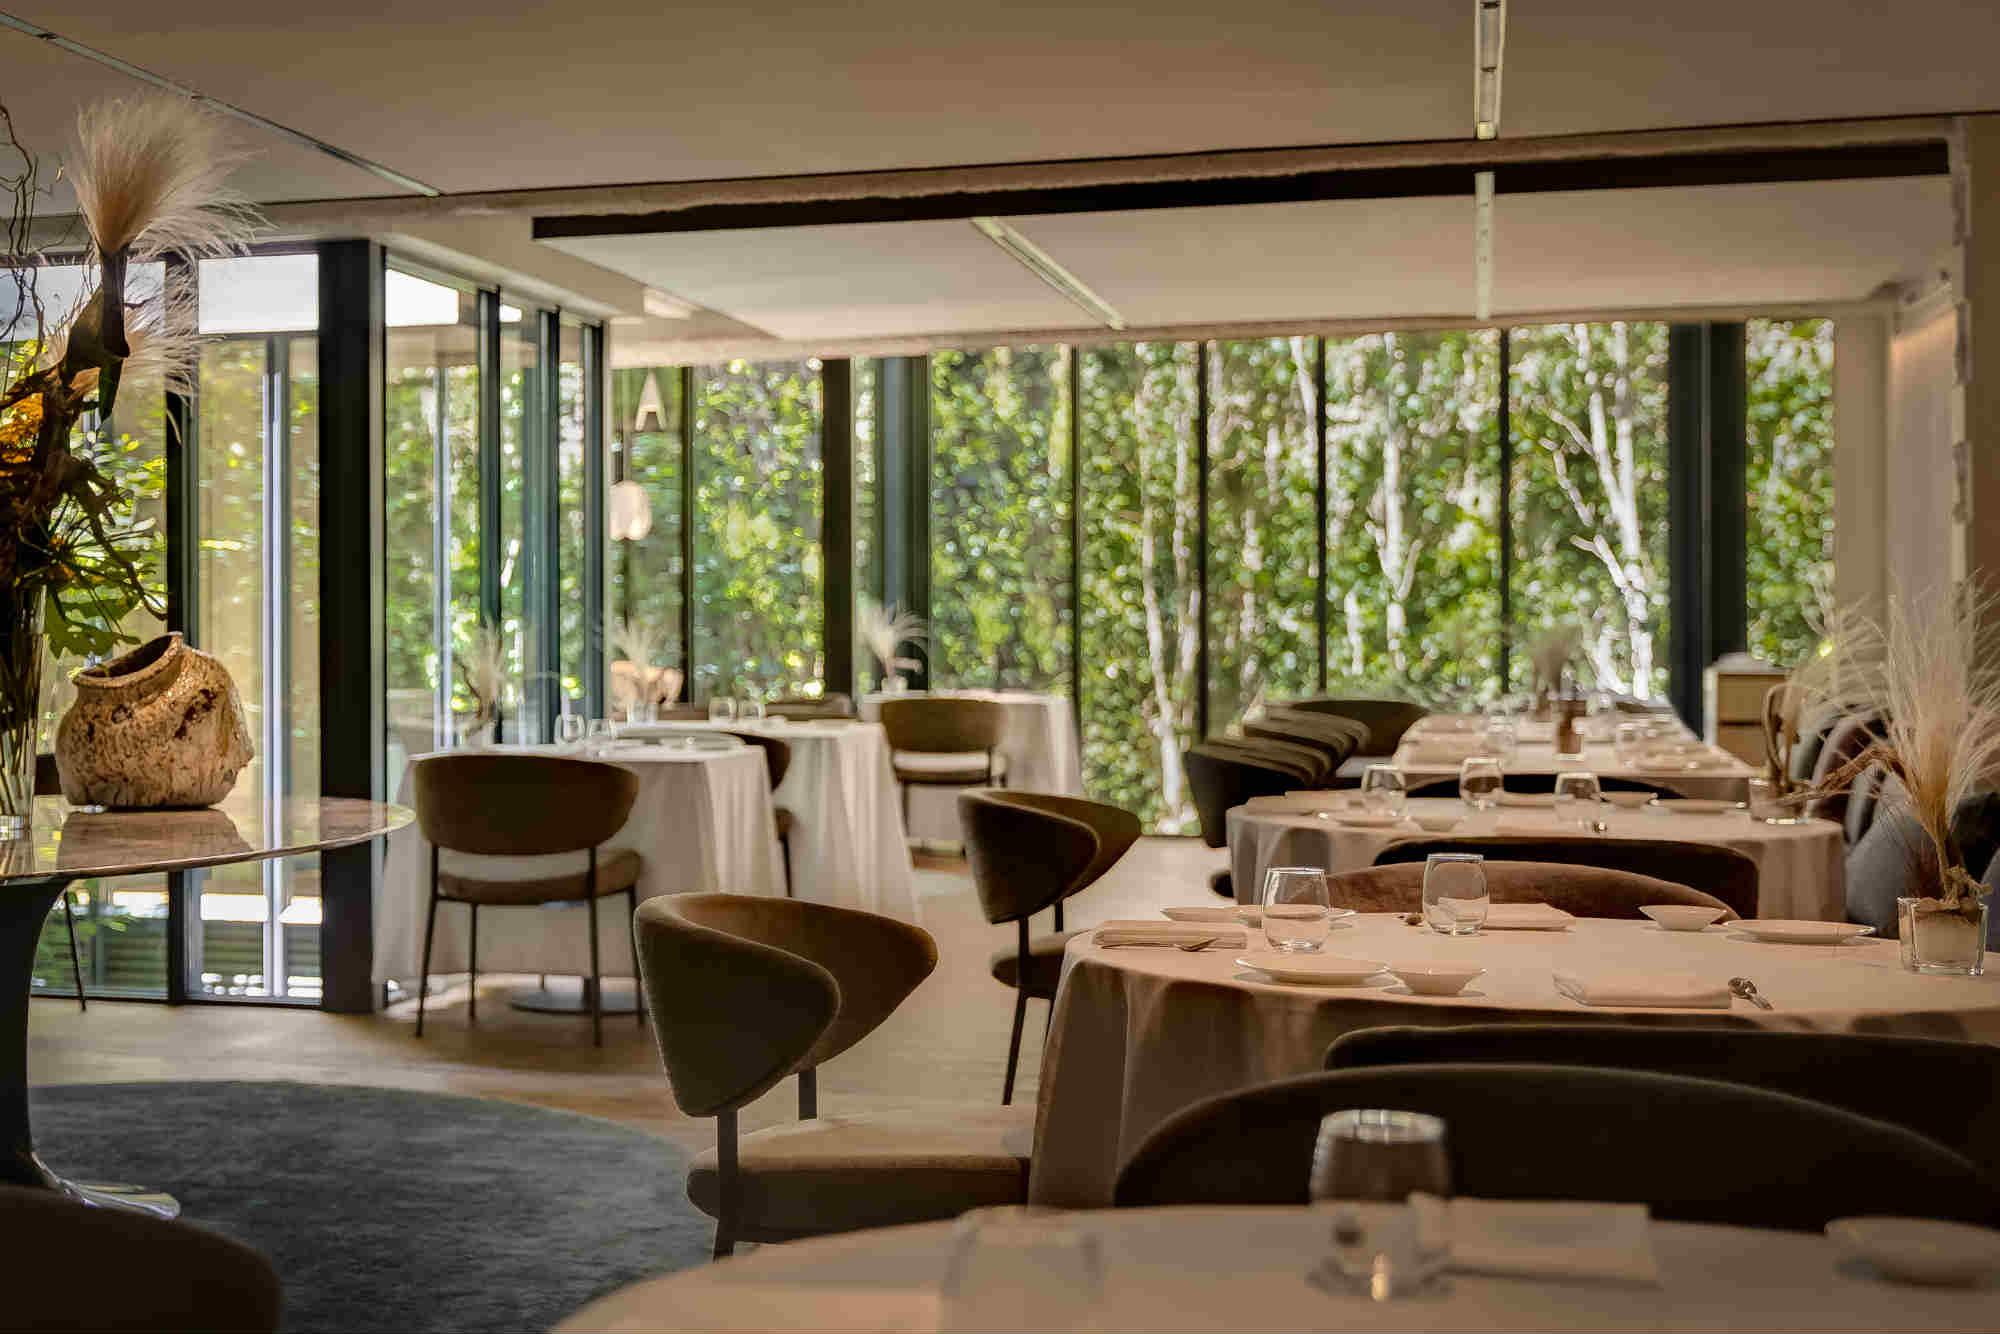 Xerta Restaurant Barcelona restaurante Ohla Eixample Fran-López